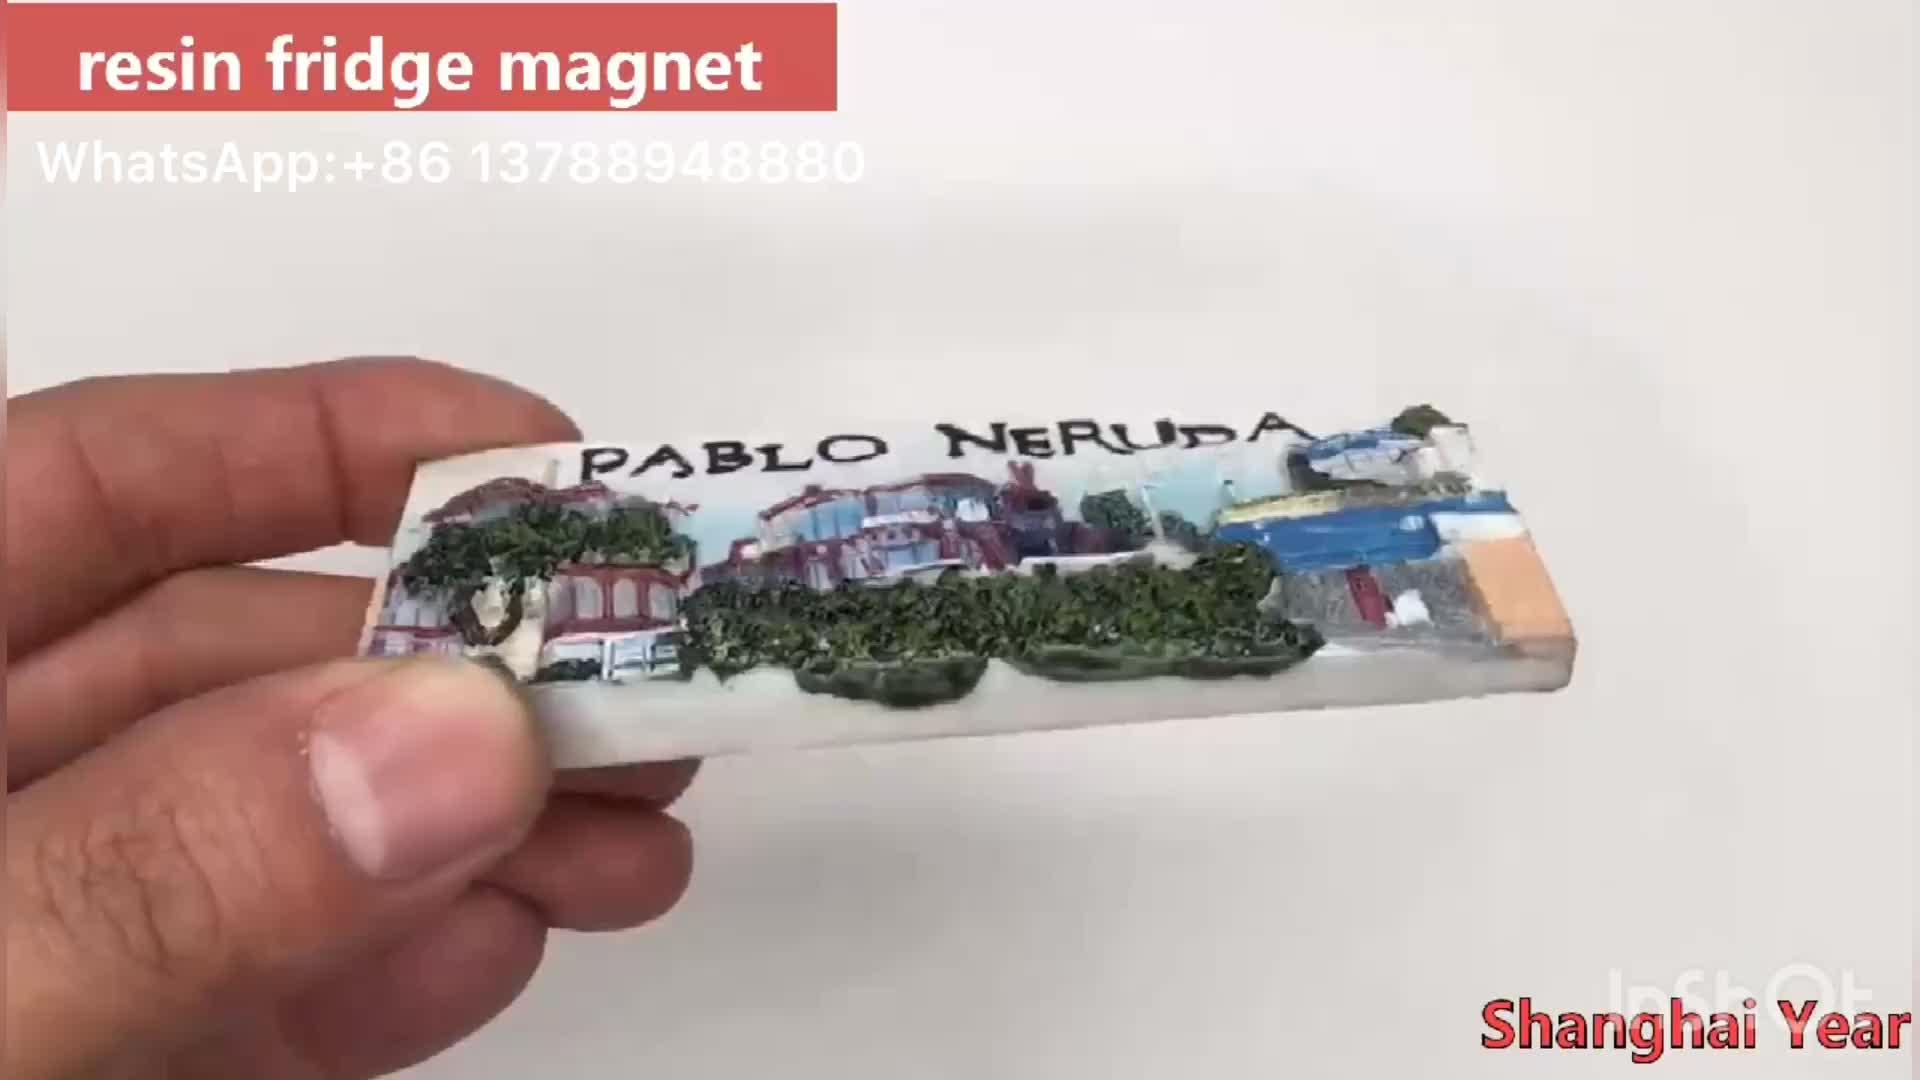 Hot Selling Souvenir 3D Resin Fridge Magnet for Tourist Gifts